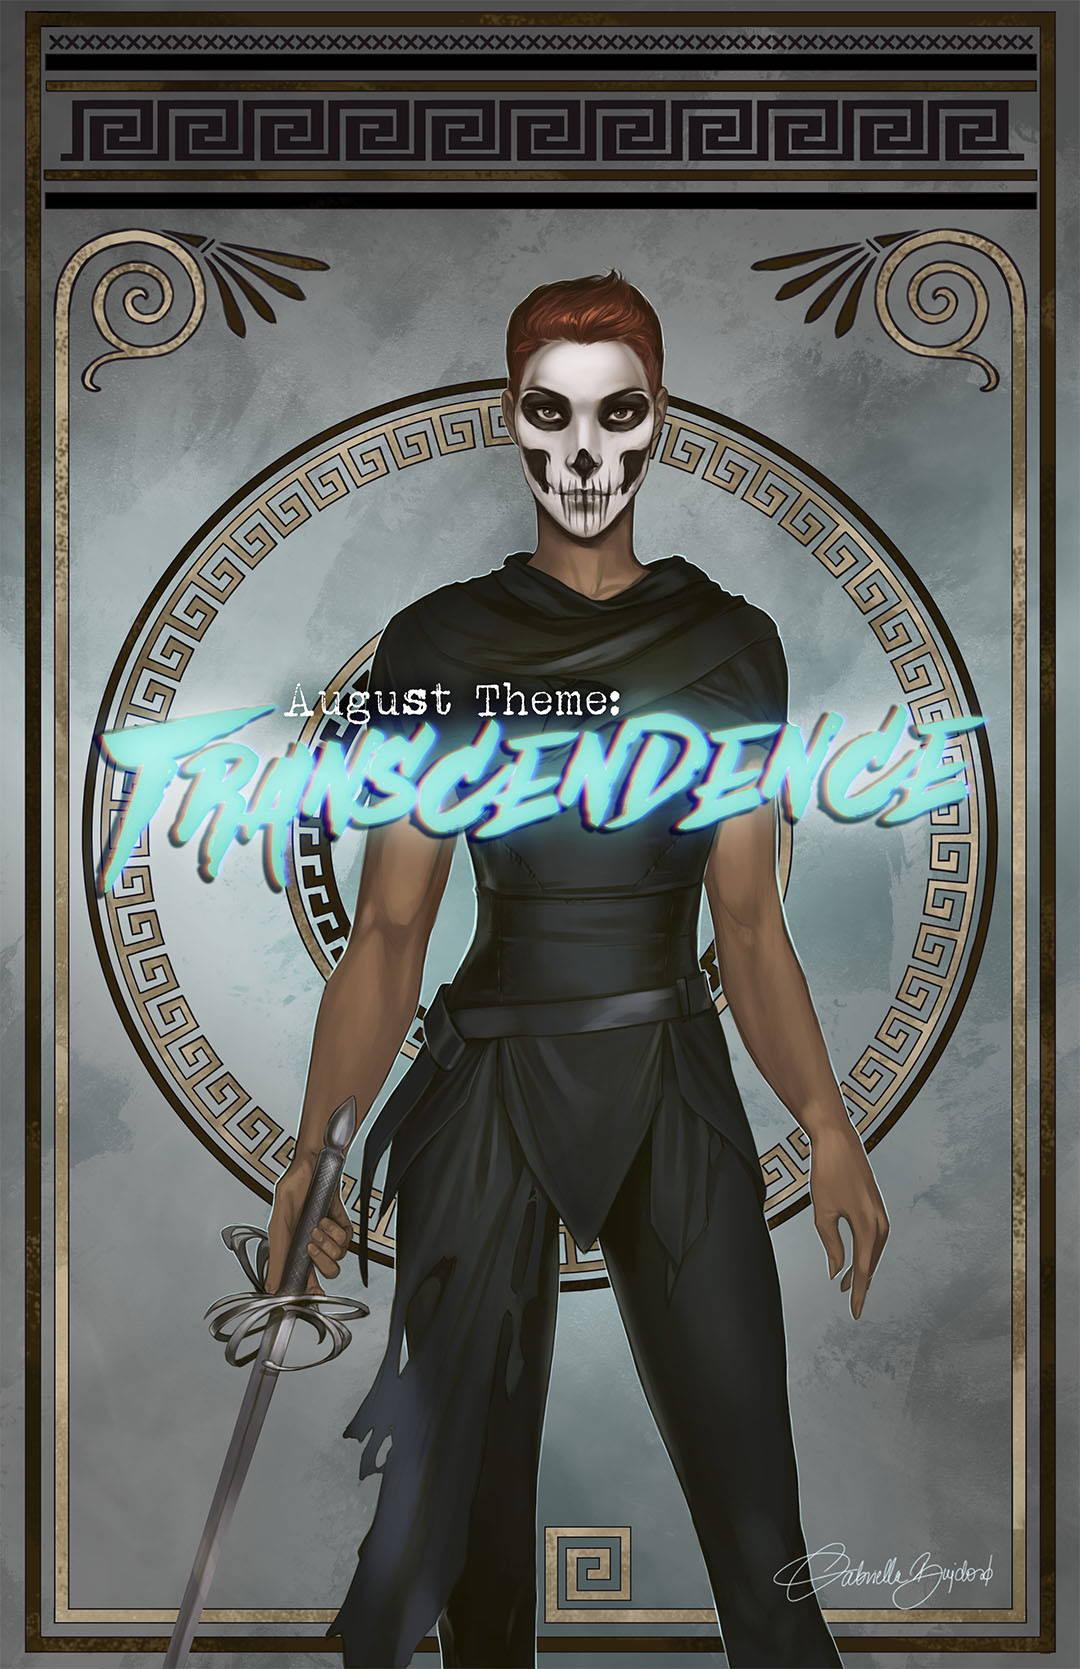 August Theme: Transcendence